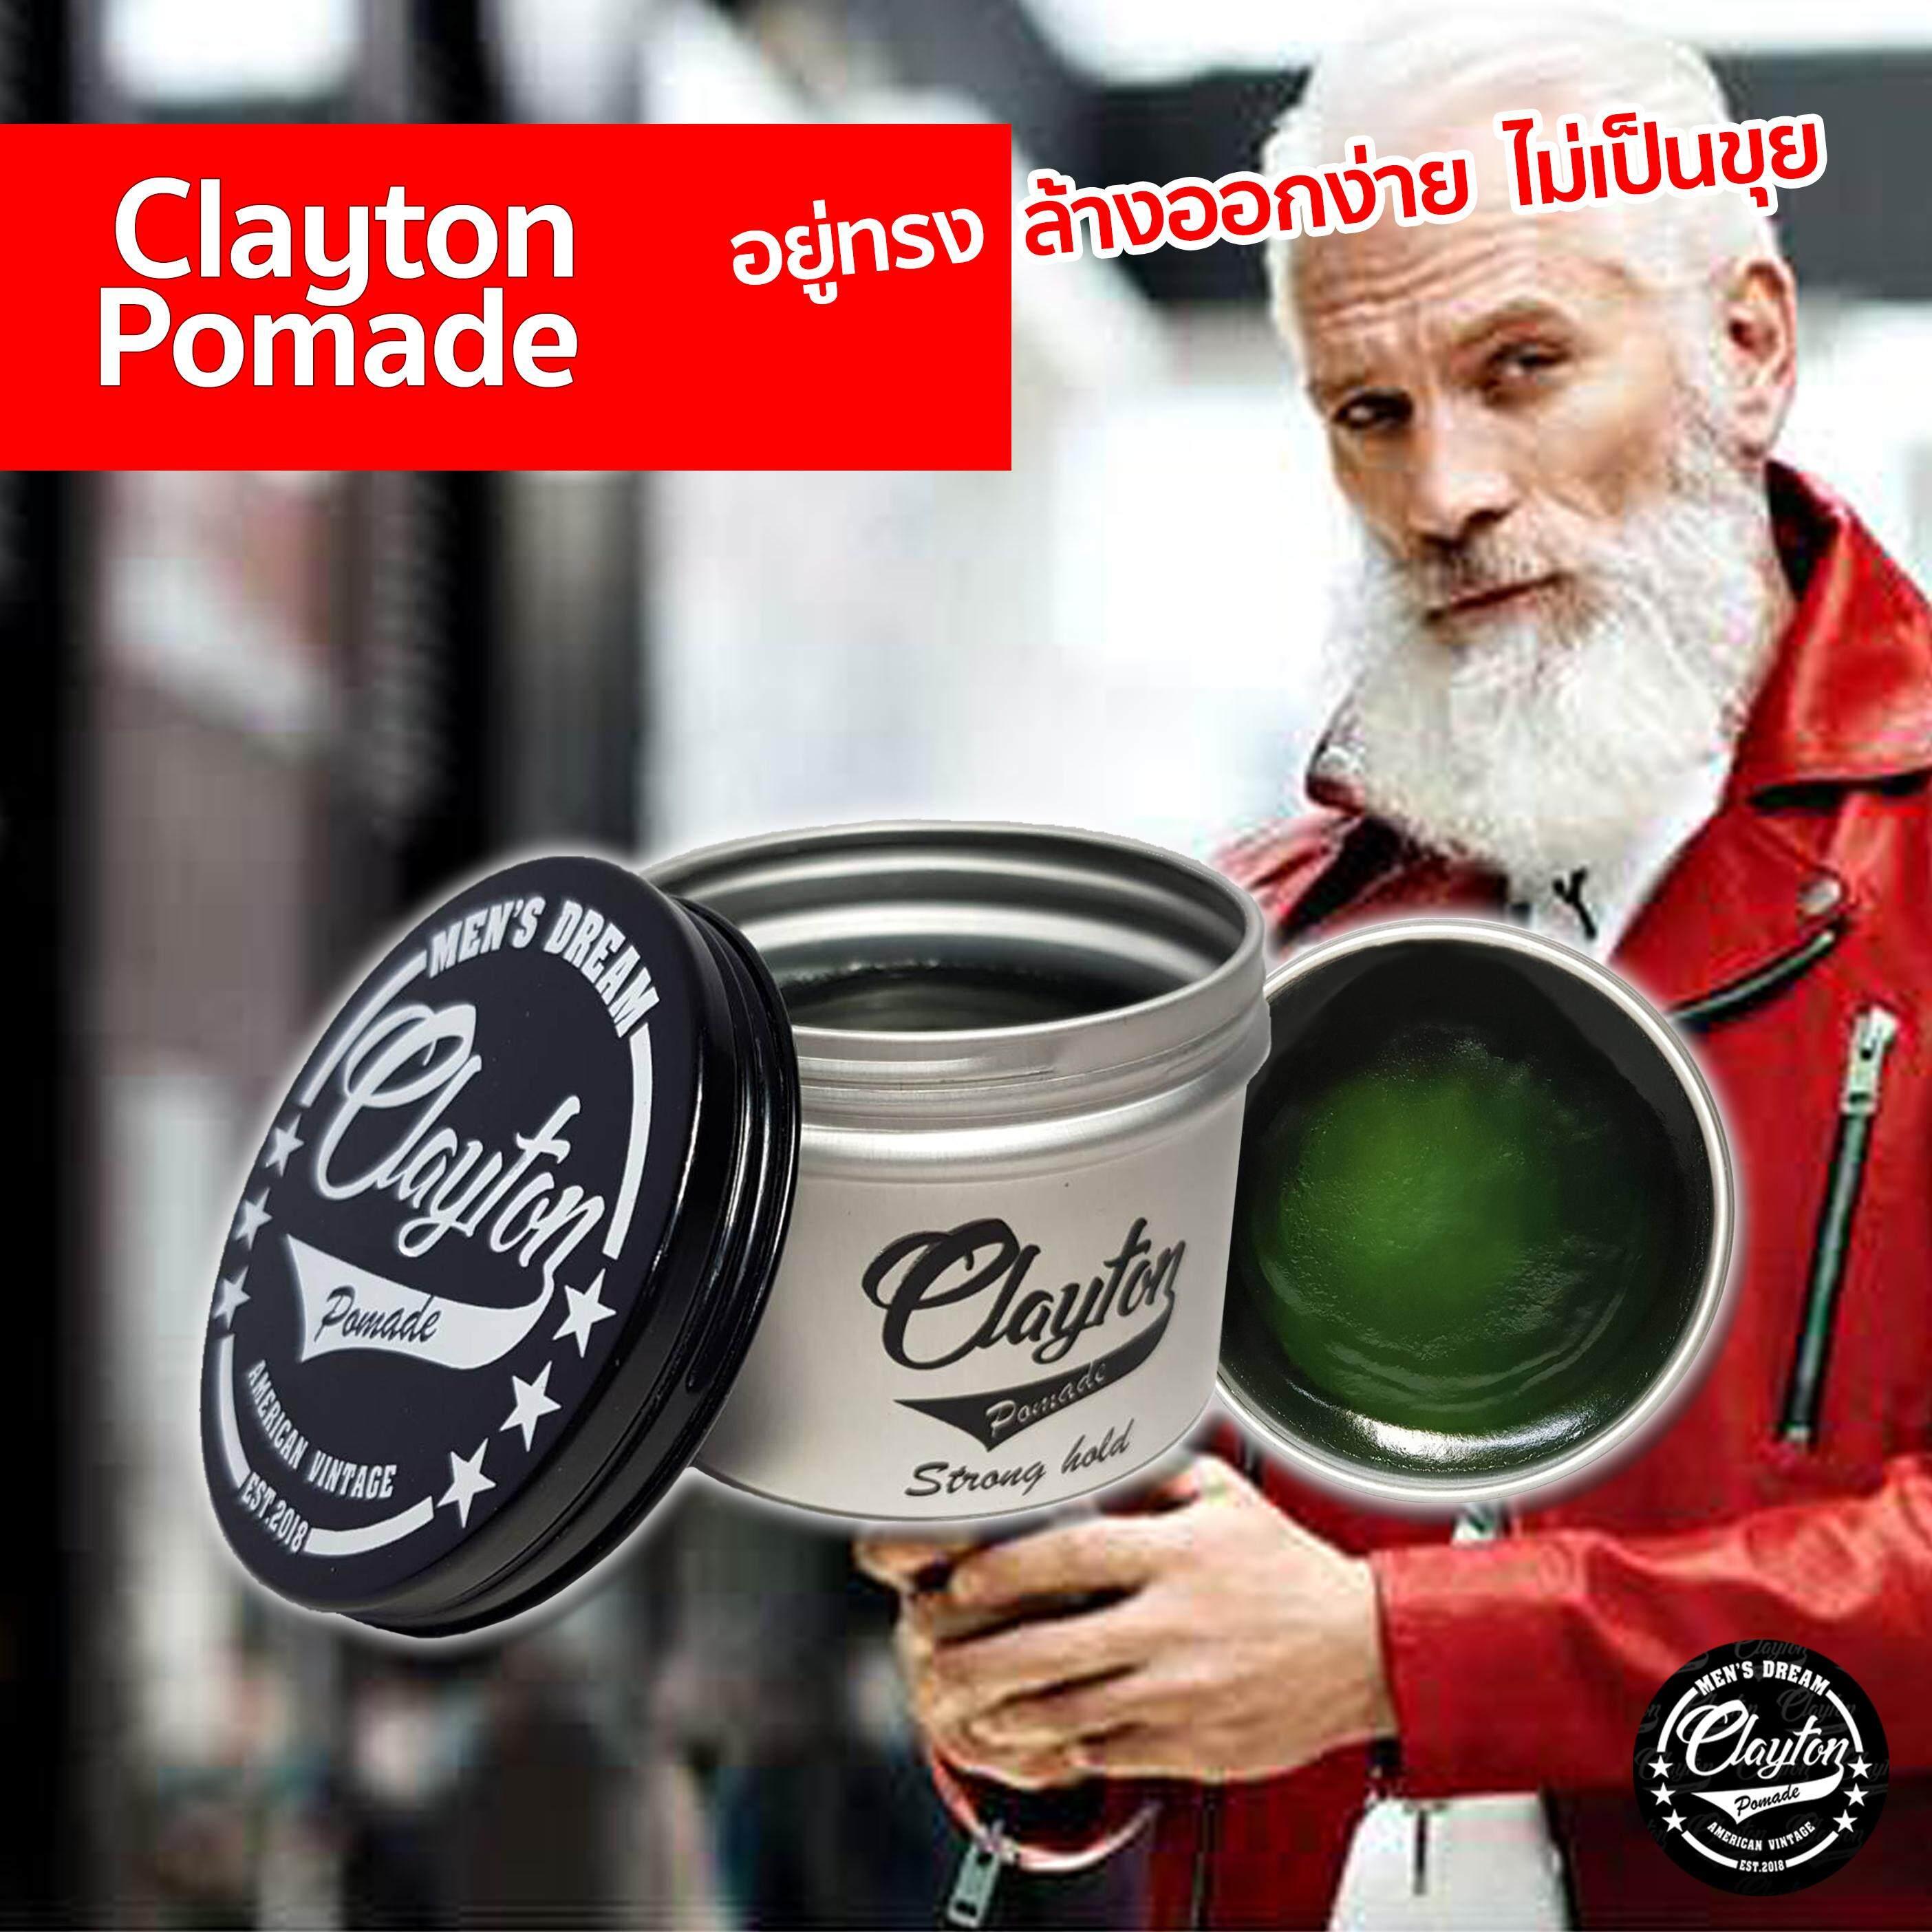 Clayton Pomade (merry Christmas).